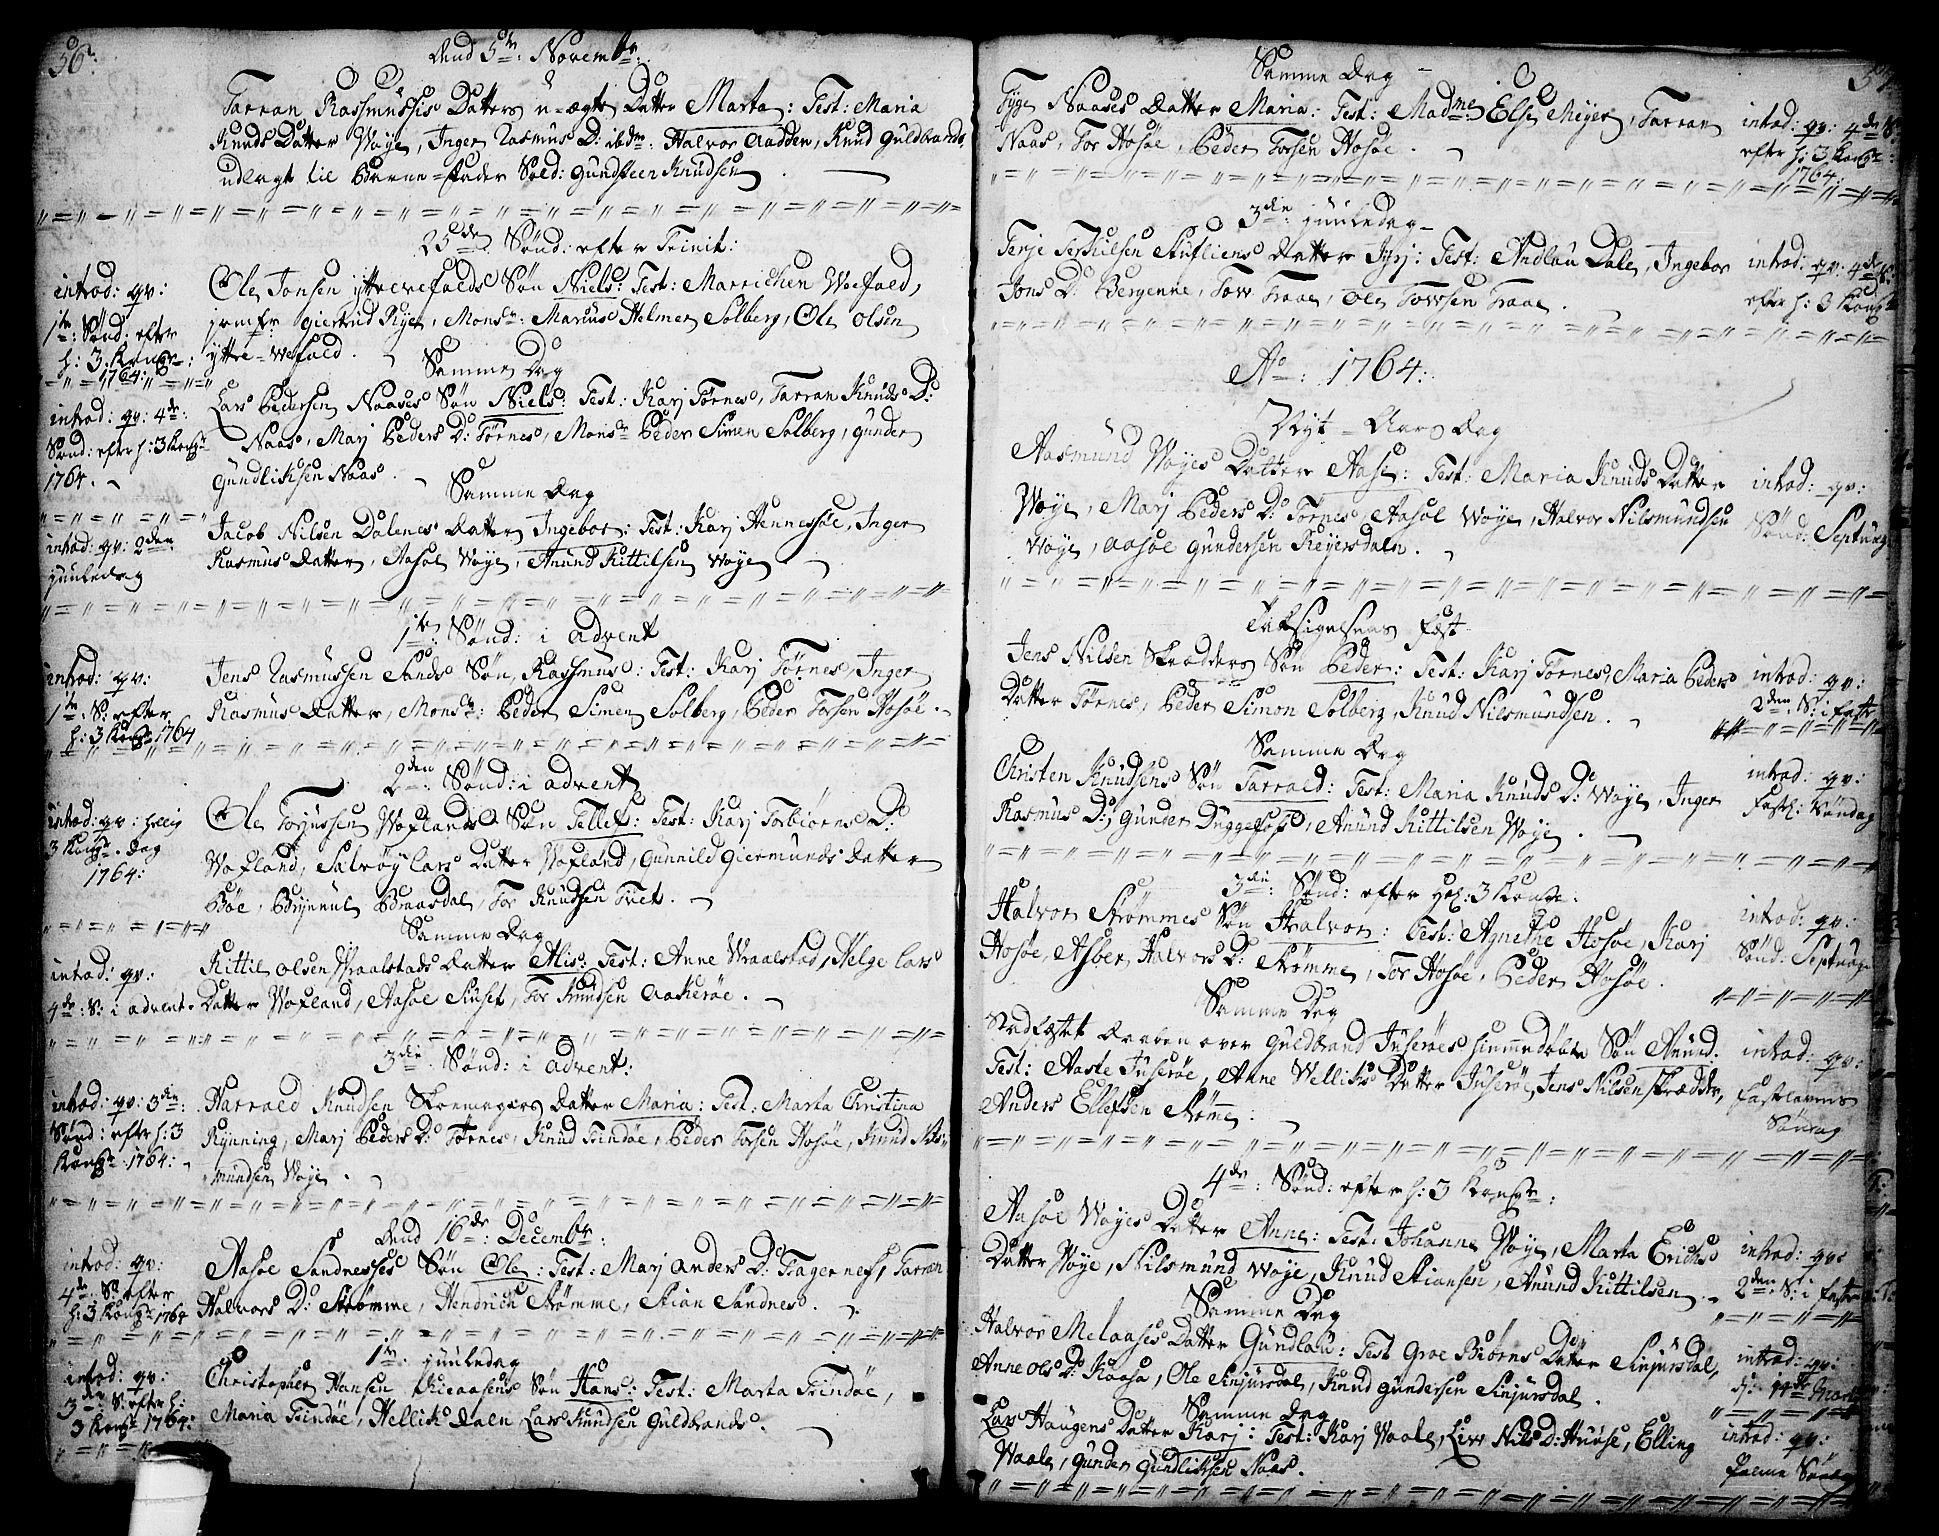 SAKO, Drangedal kirkebøker, F/Fa/L0001: Ministerialbok nr. 1, 1697-1767, s. 56-57